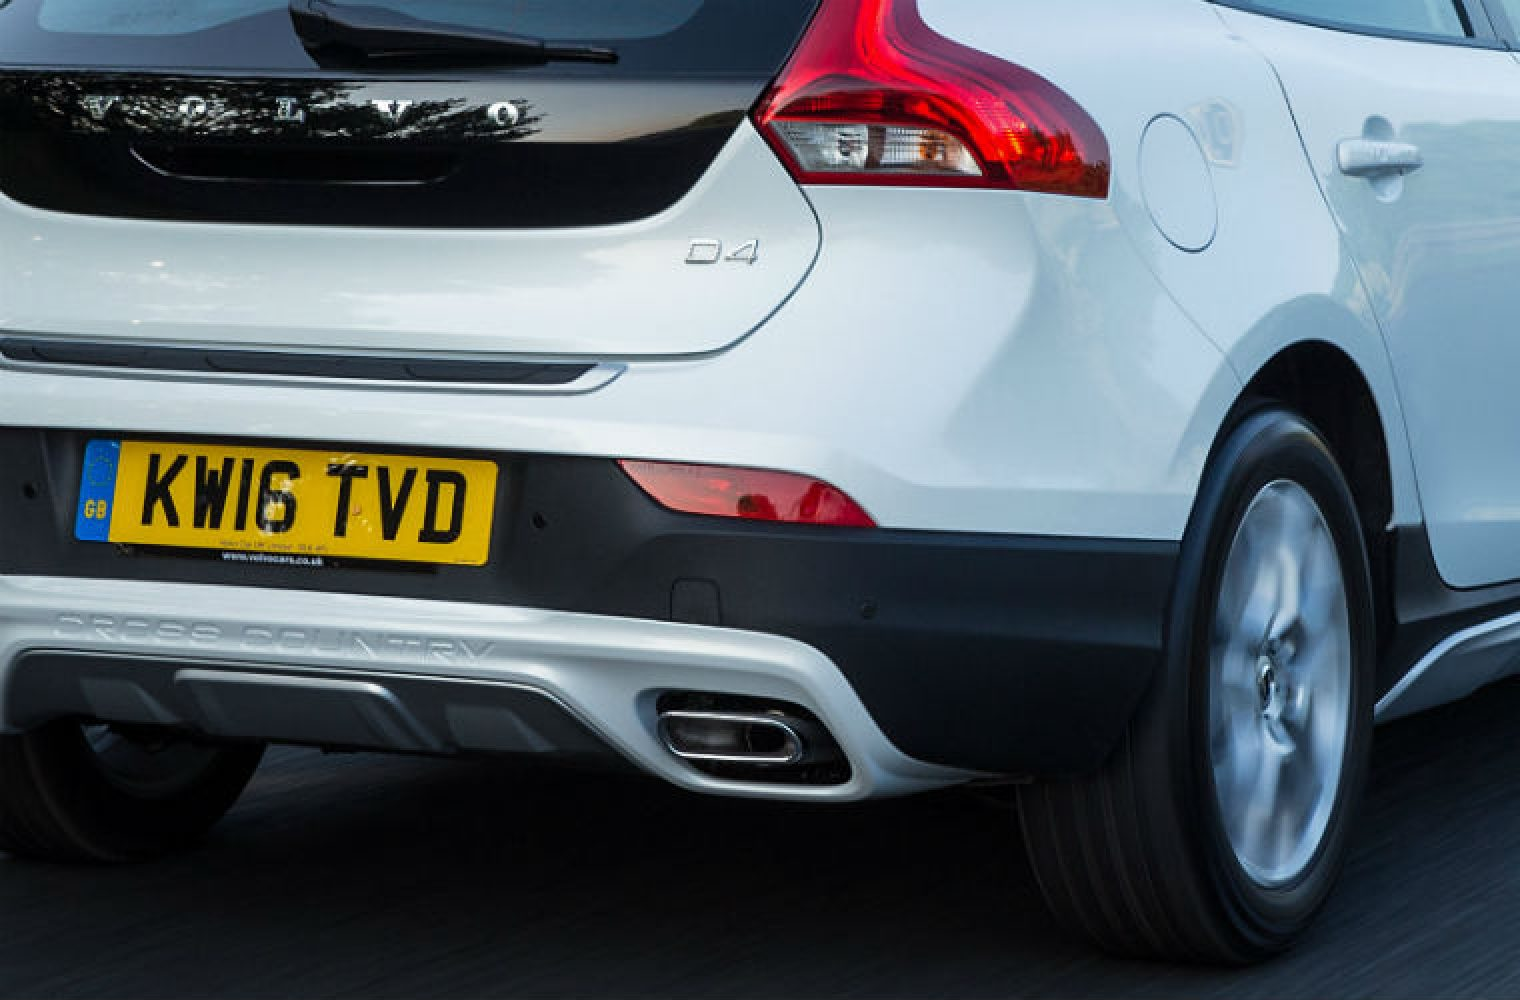 Volvo fuel leak fears prompt 200,000 recalls - Garagewire